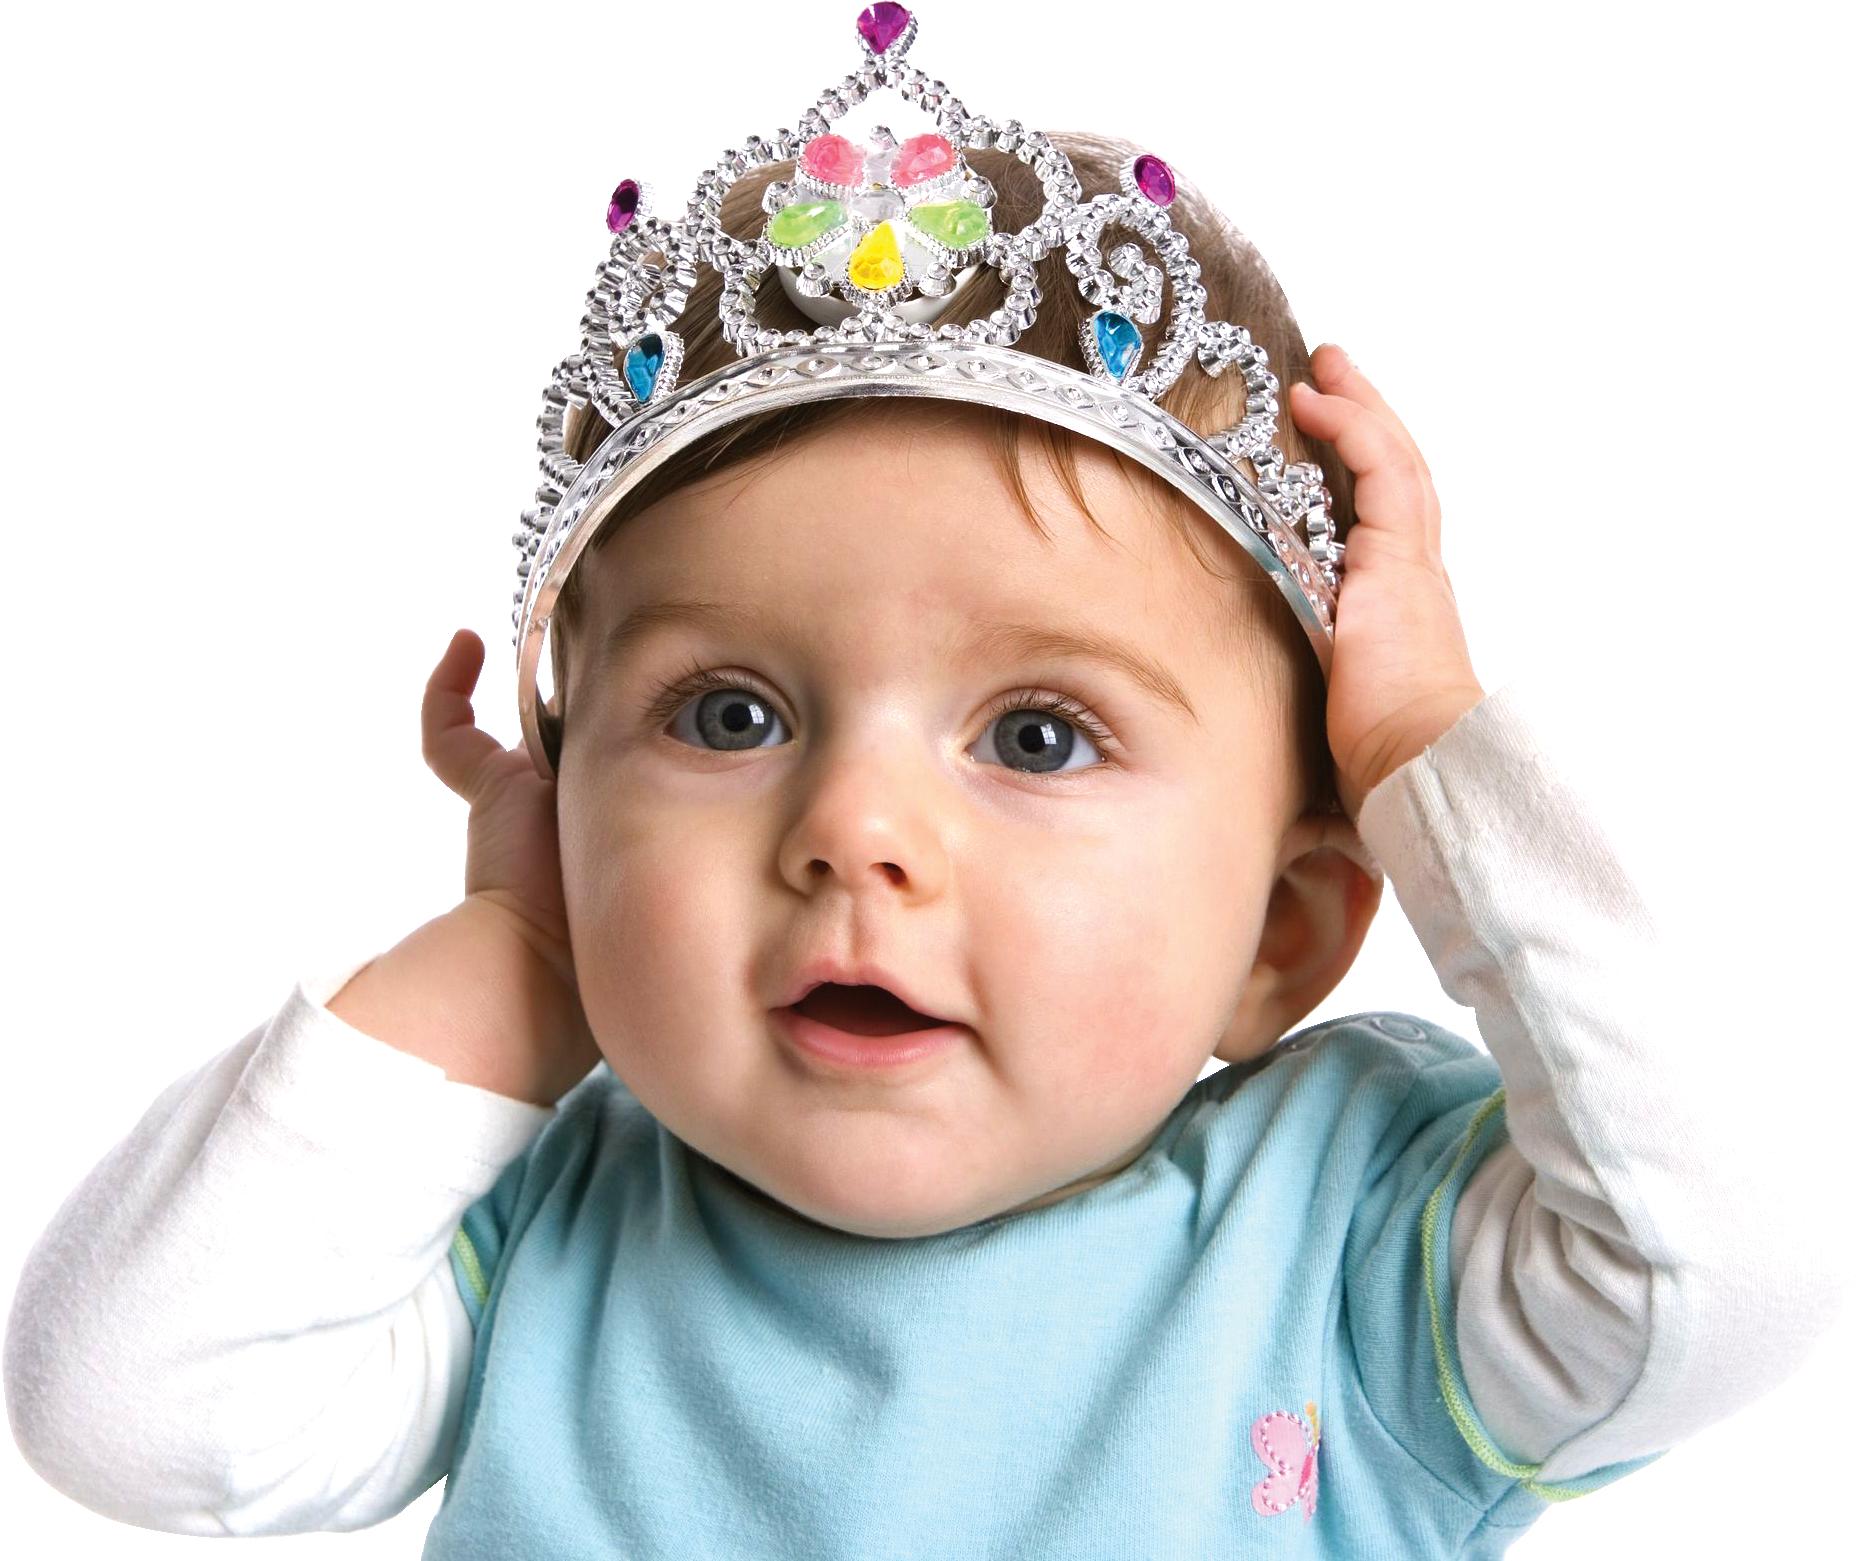 Baby Girl PNG Image